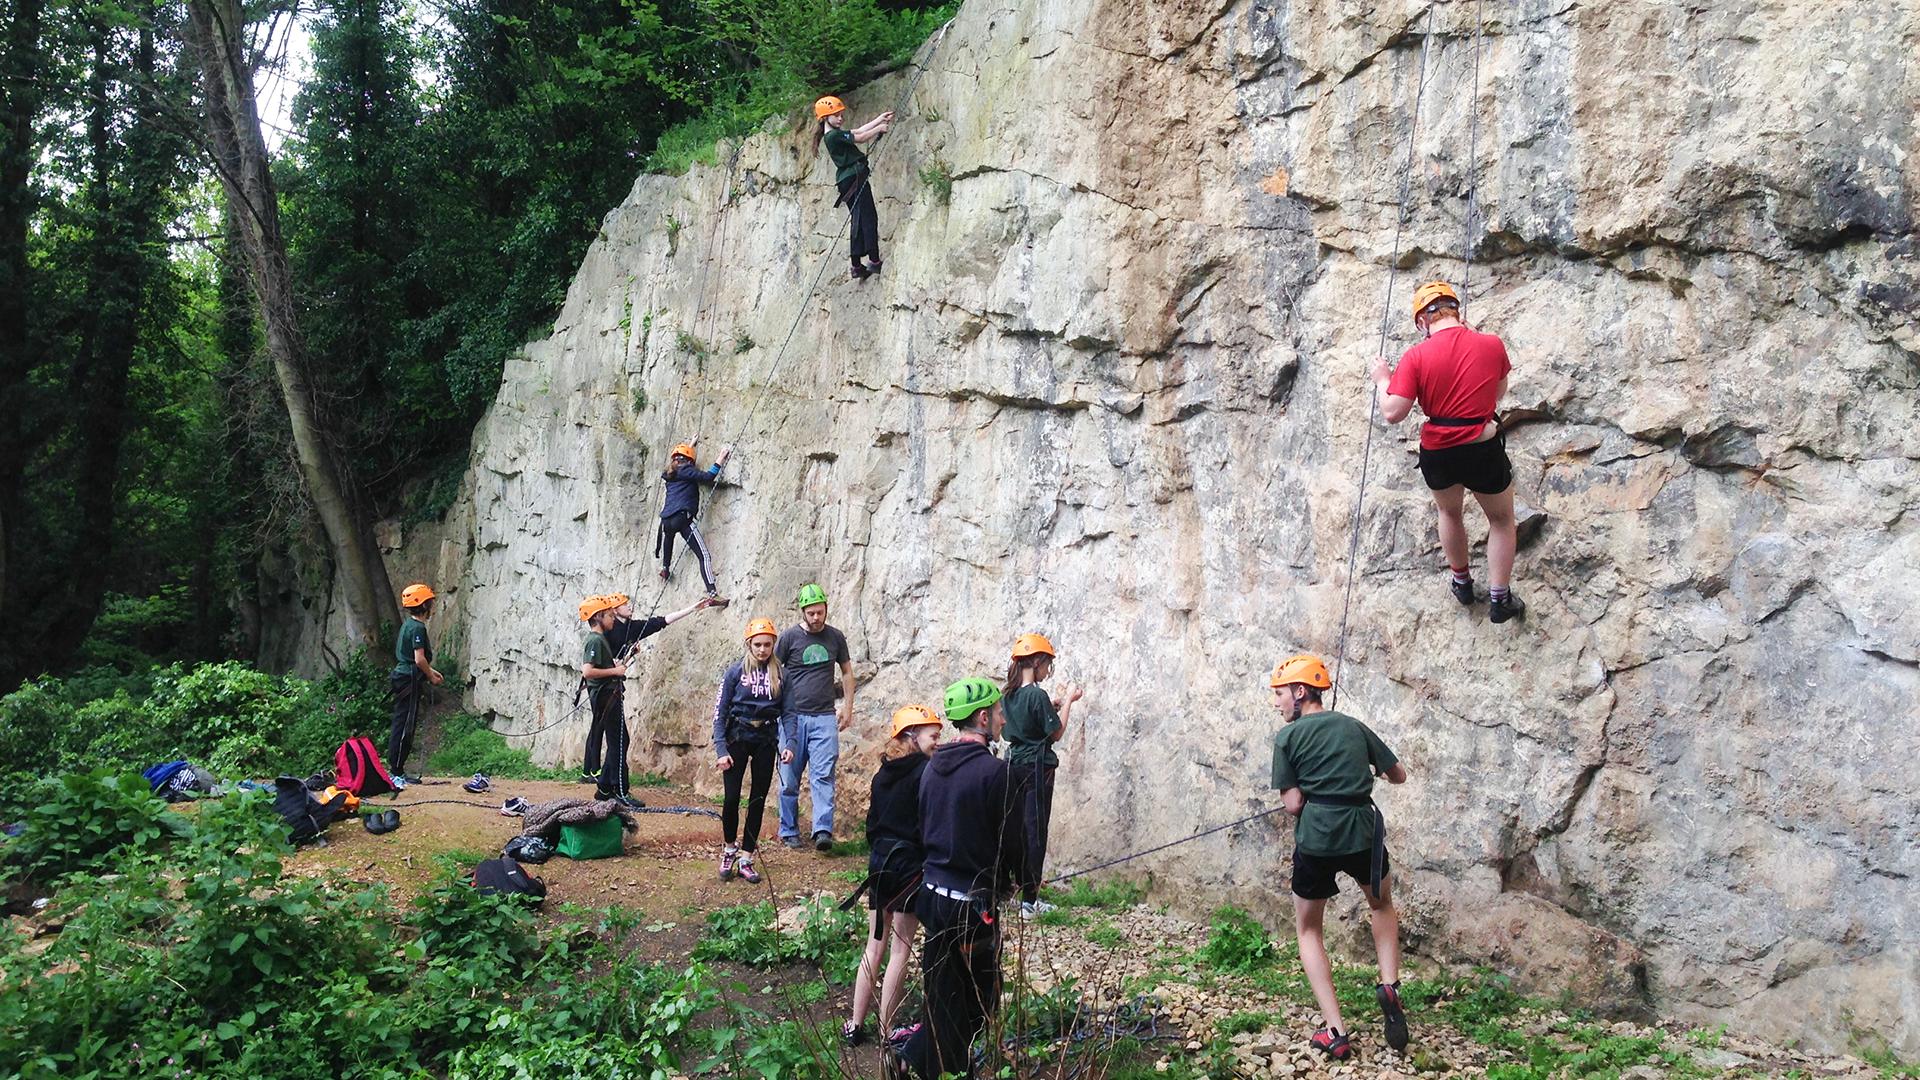 People climbing a big rock